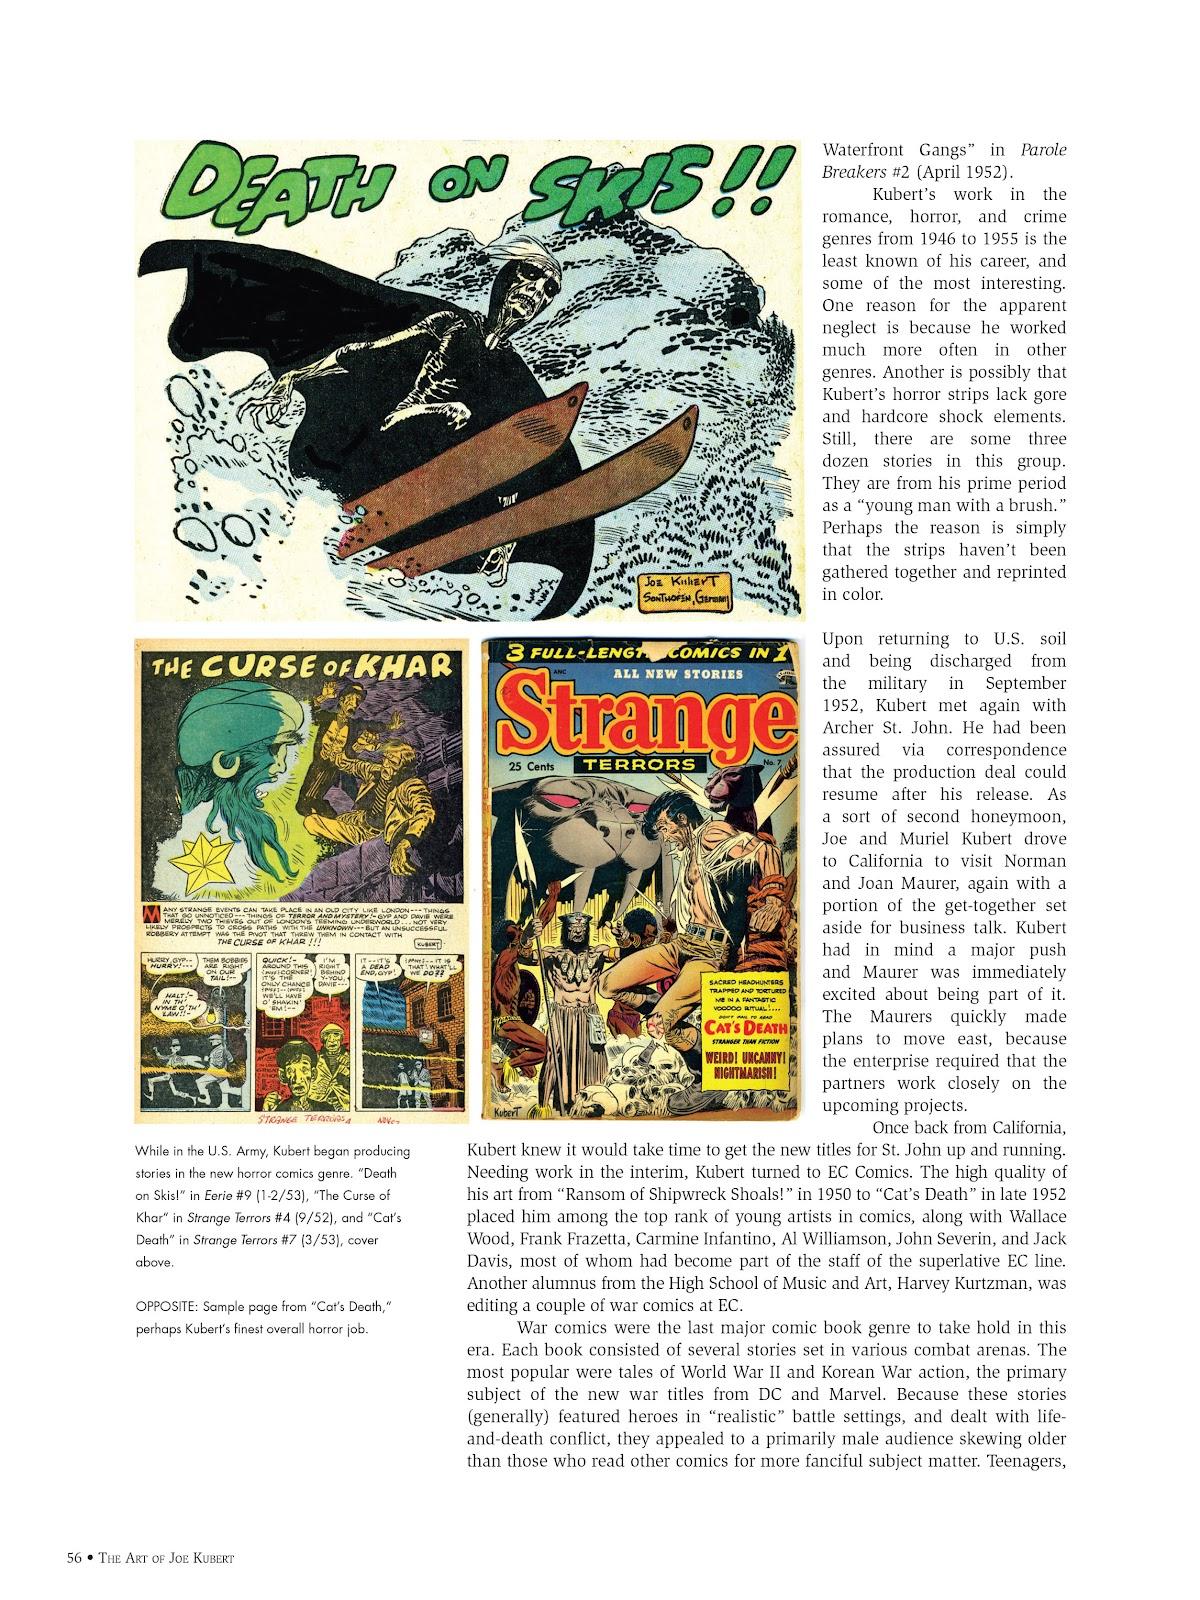 Read online The Art of Joe Kubert comic -  Issue # TPB (Part 1) - 55